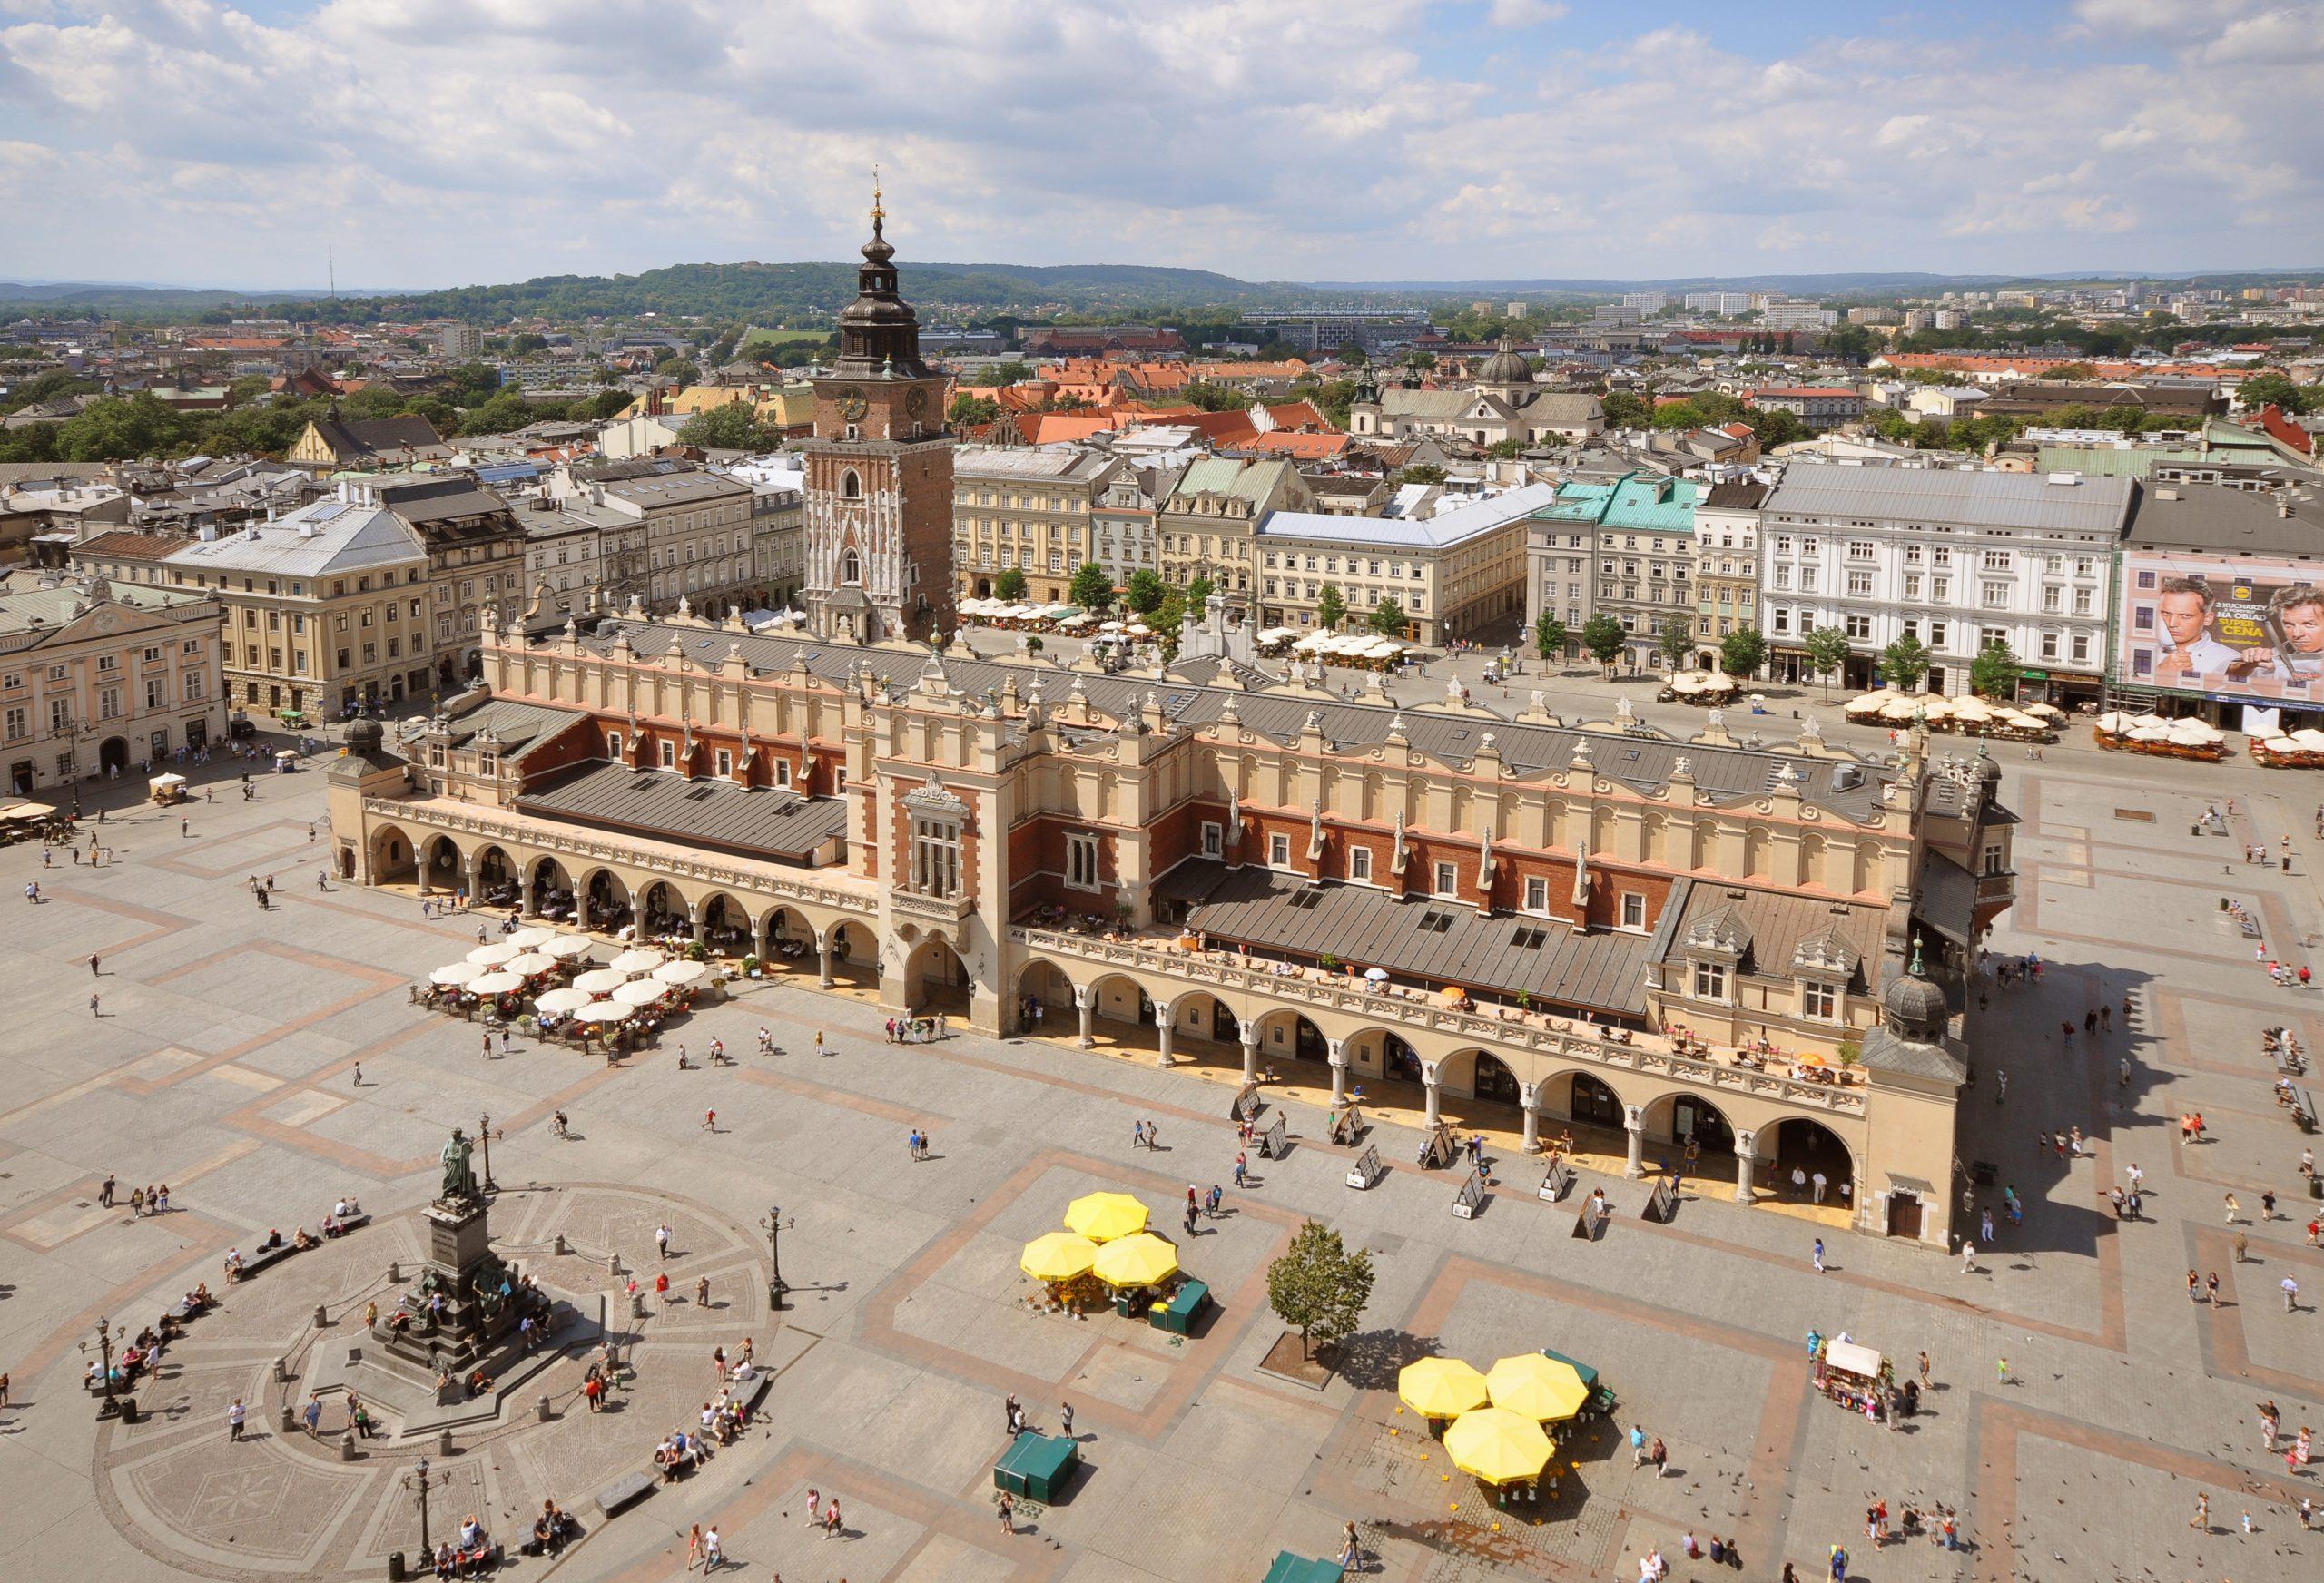 Tourist Attractions in Poland: Main Market Square